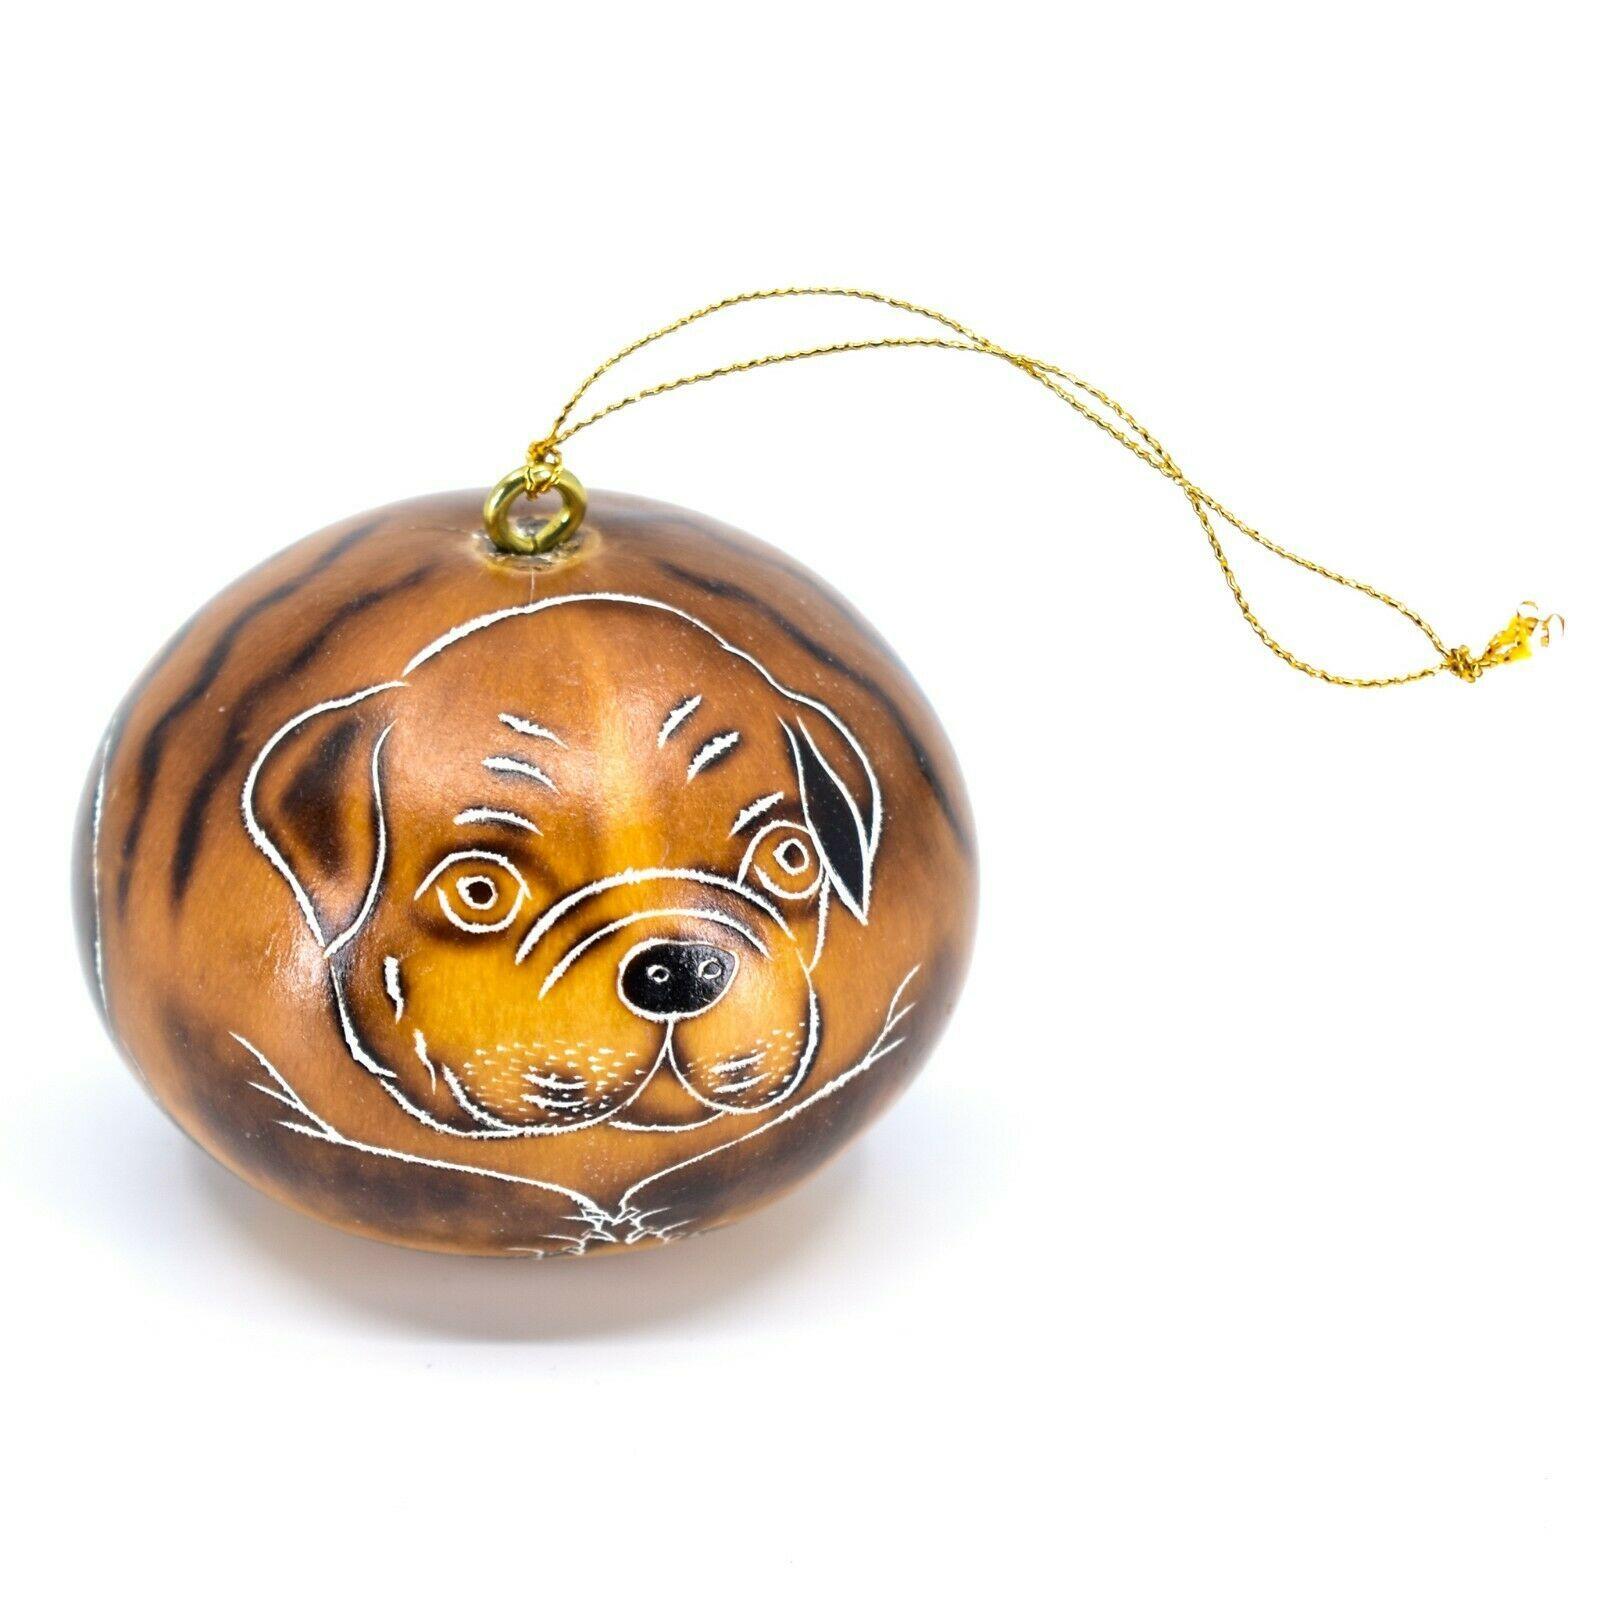 Handcrafted Carved Gourd Art English Bulldog Puppy Dog Ornament Handmade in Peru